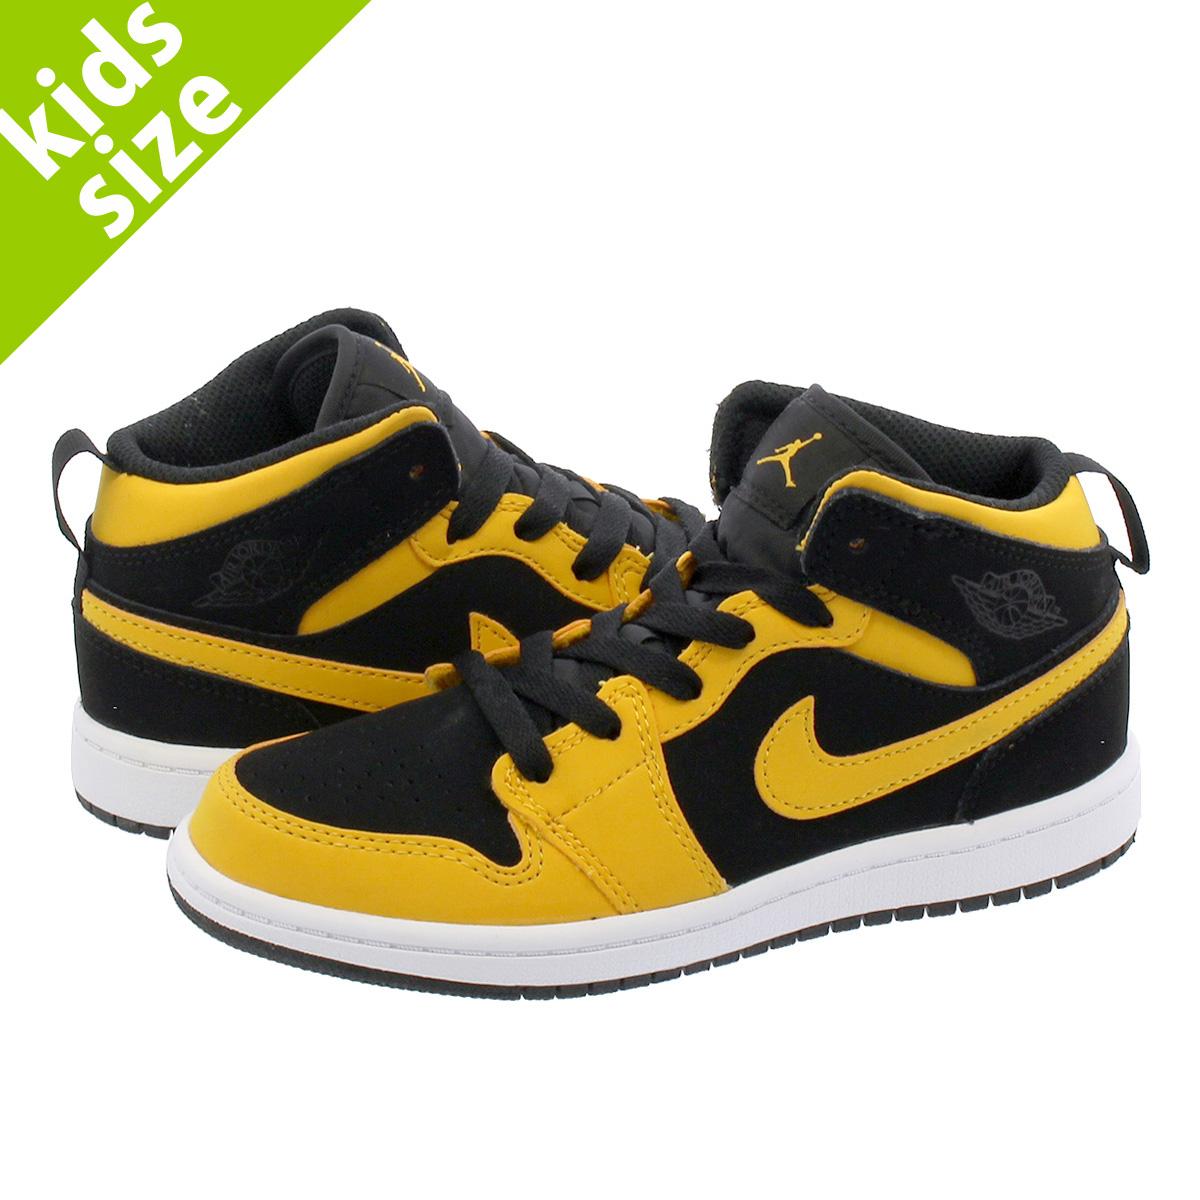 timeless design 5342d 98ae6 NIKE AIR JORDAN 1 MID PS Nike Air Jordan 1 mid PS BLACK/YELLOW 640,734-071